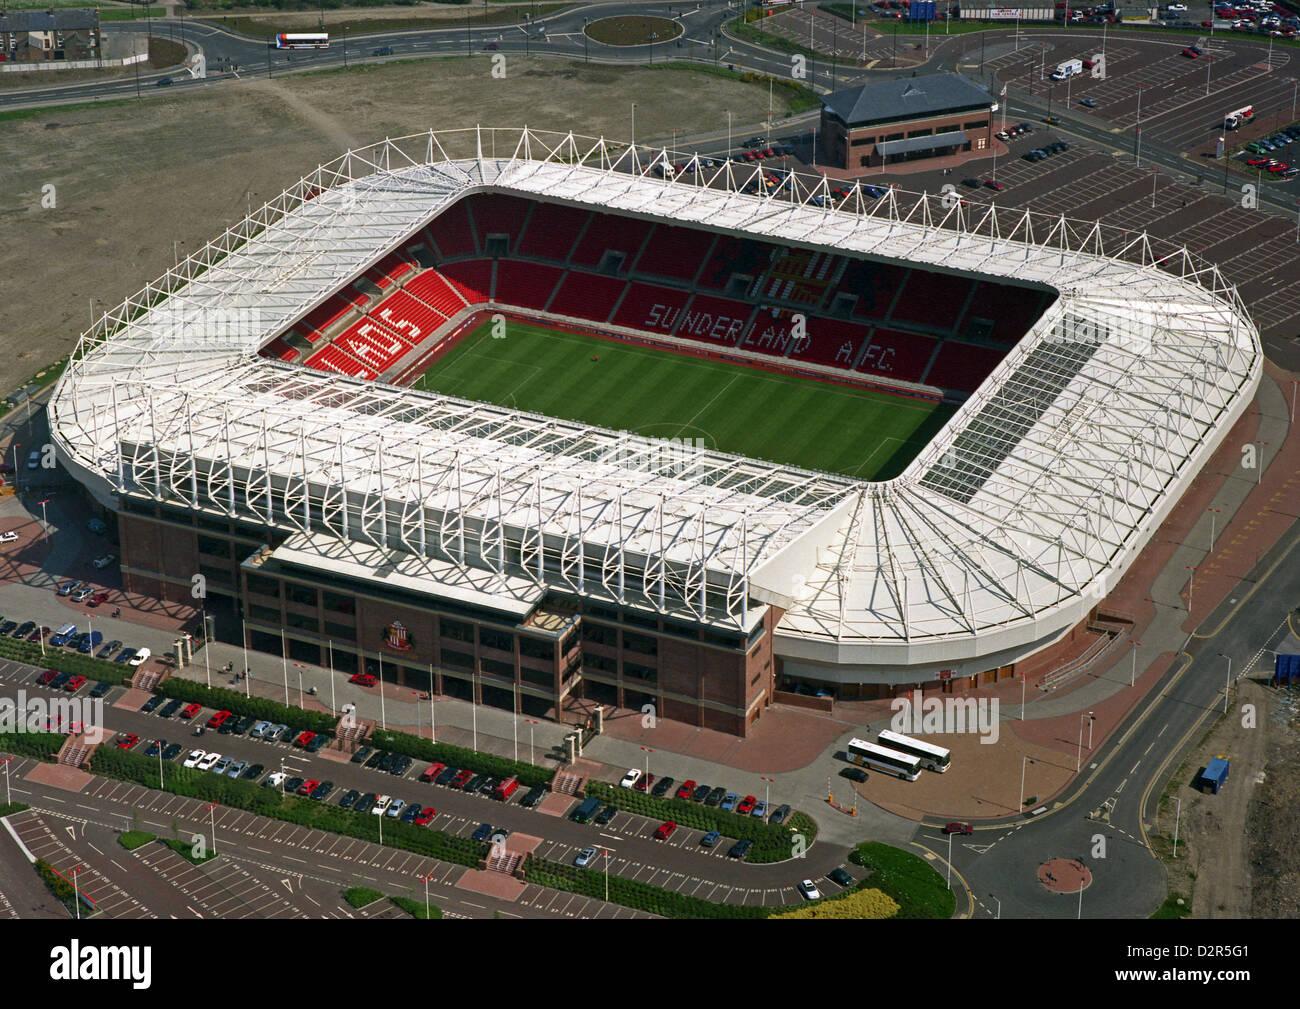 aerial view of Sunderland Football Club's Stadium of Light - Stock Image